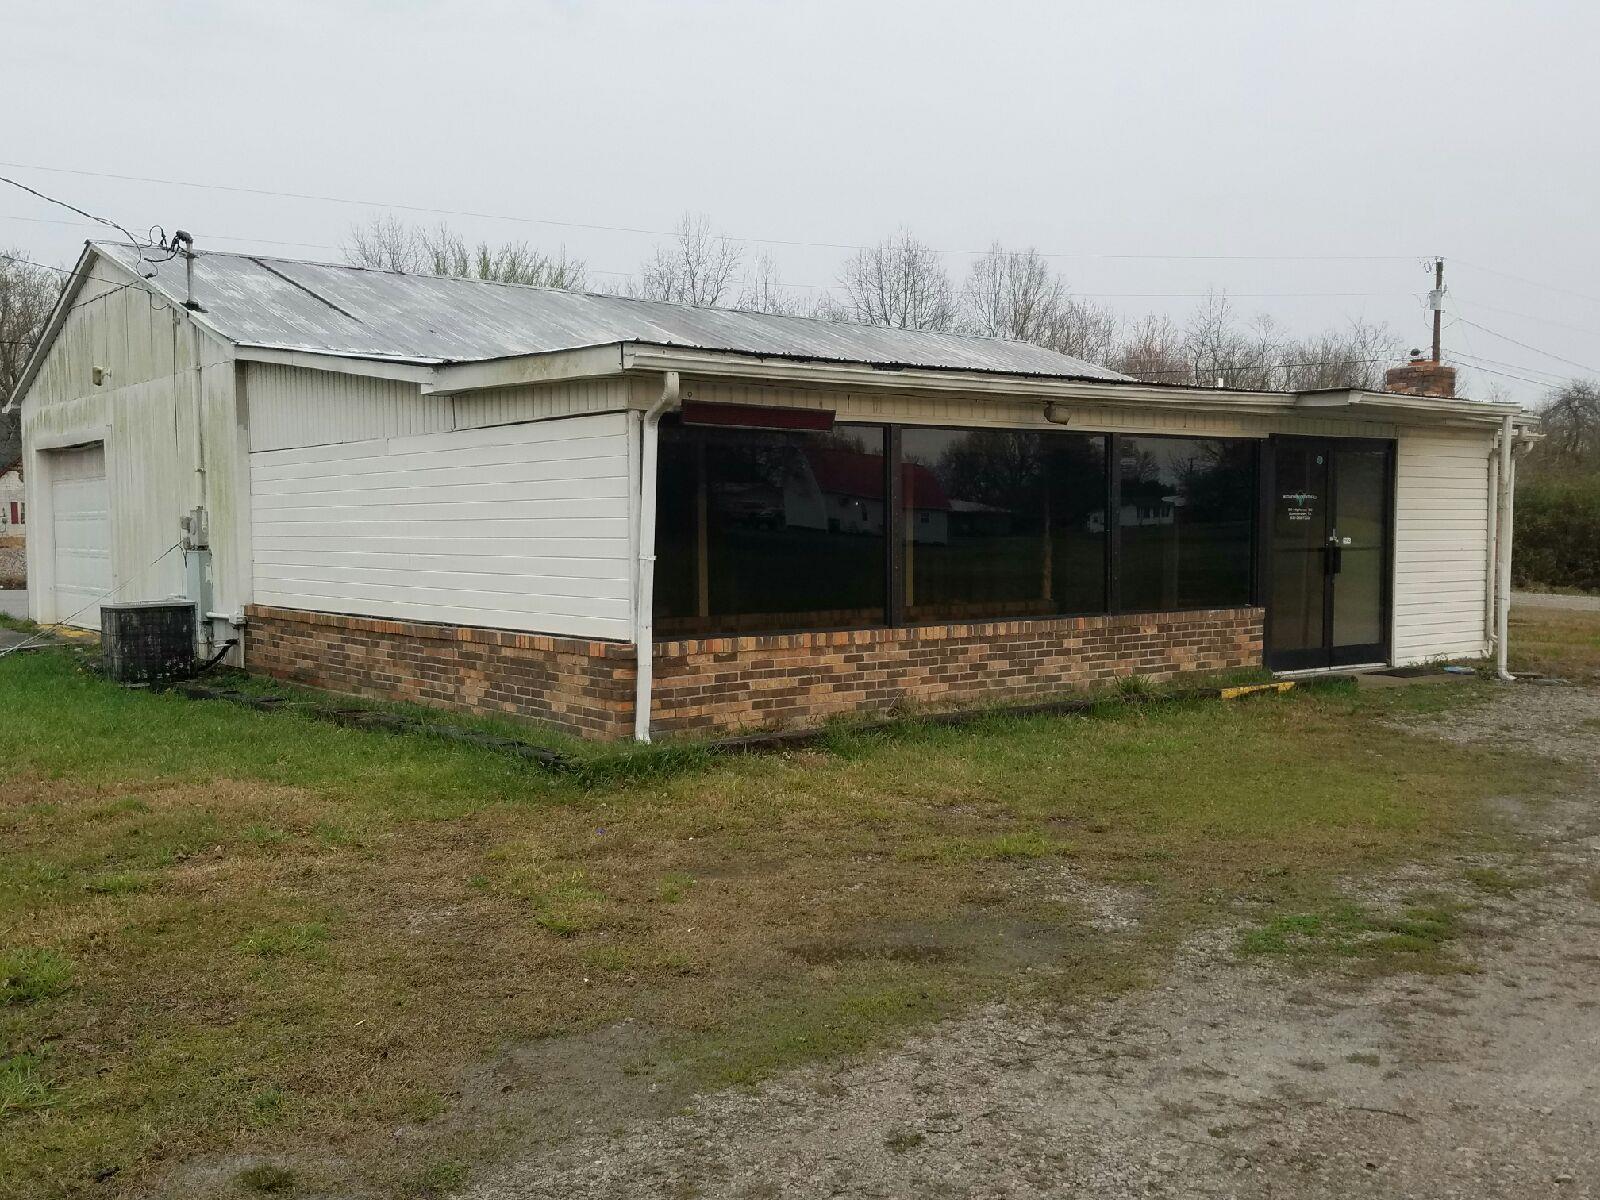 56 Highway 20, Summertown, TN 38483